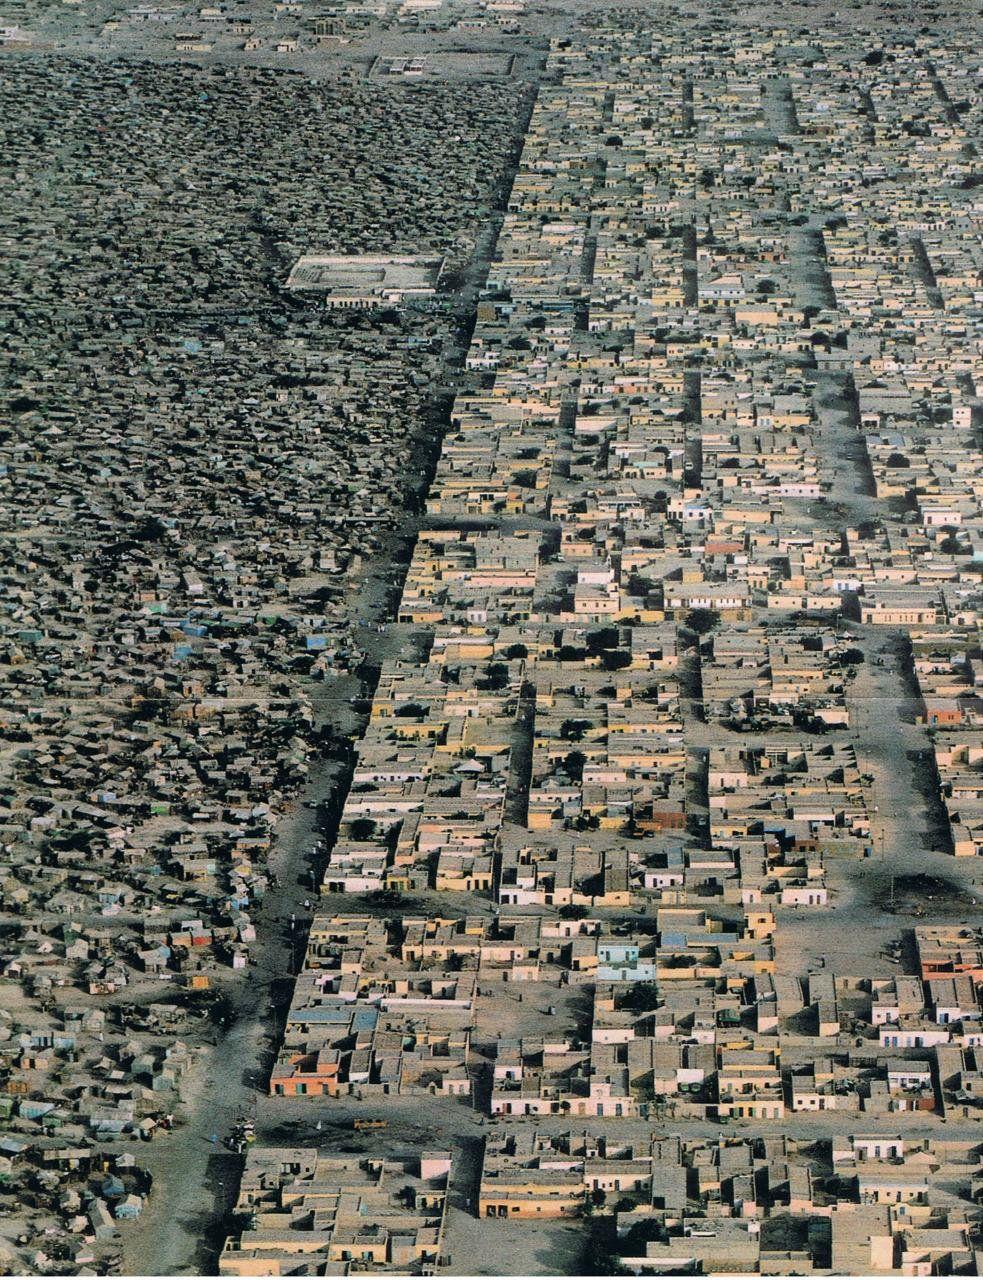 Nouakchott Mauritania By Steve Mccurry Urbane Landschaft Architektur Luftfotografie